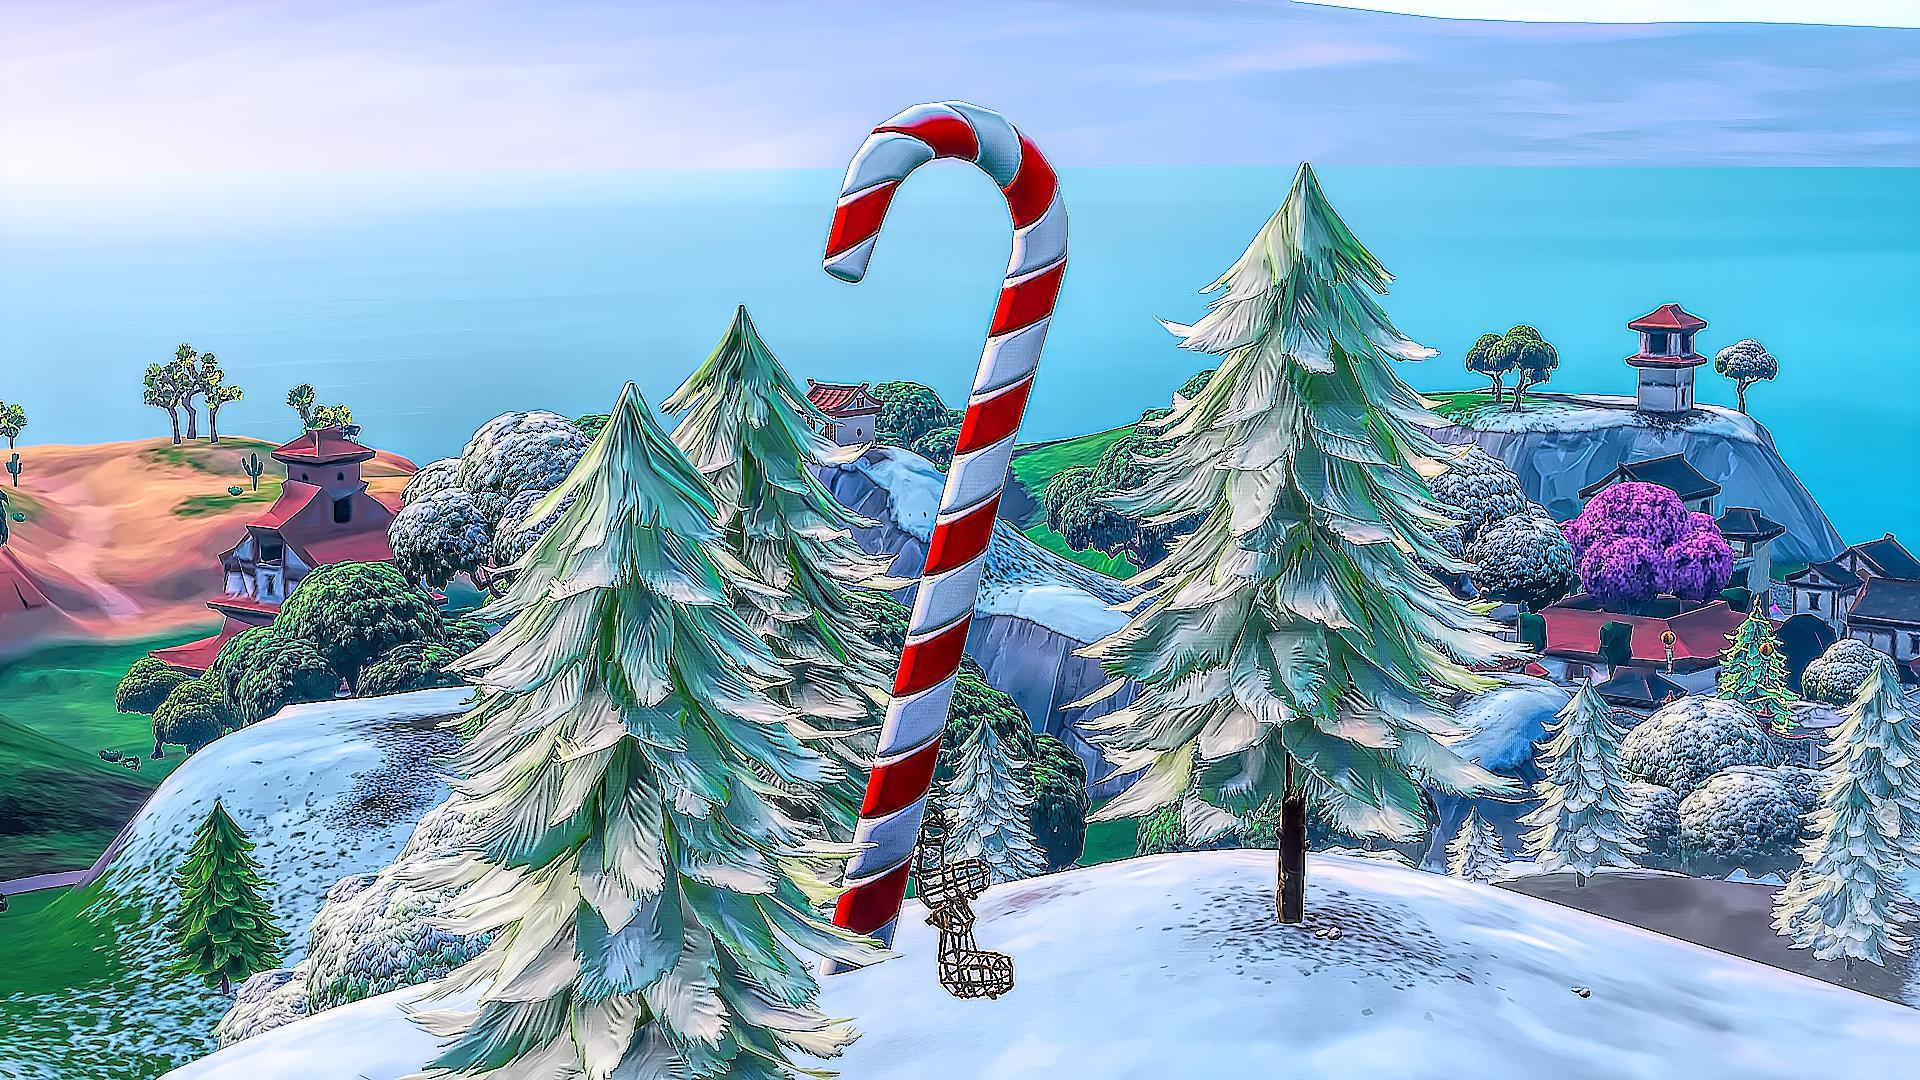 Fortnite Christmas Background Png.Fortnite Christmas Event Desktop Wallpapers Top Free